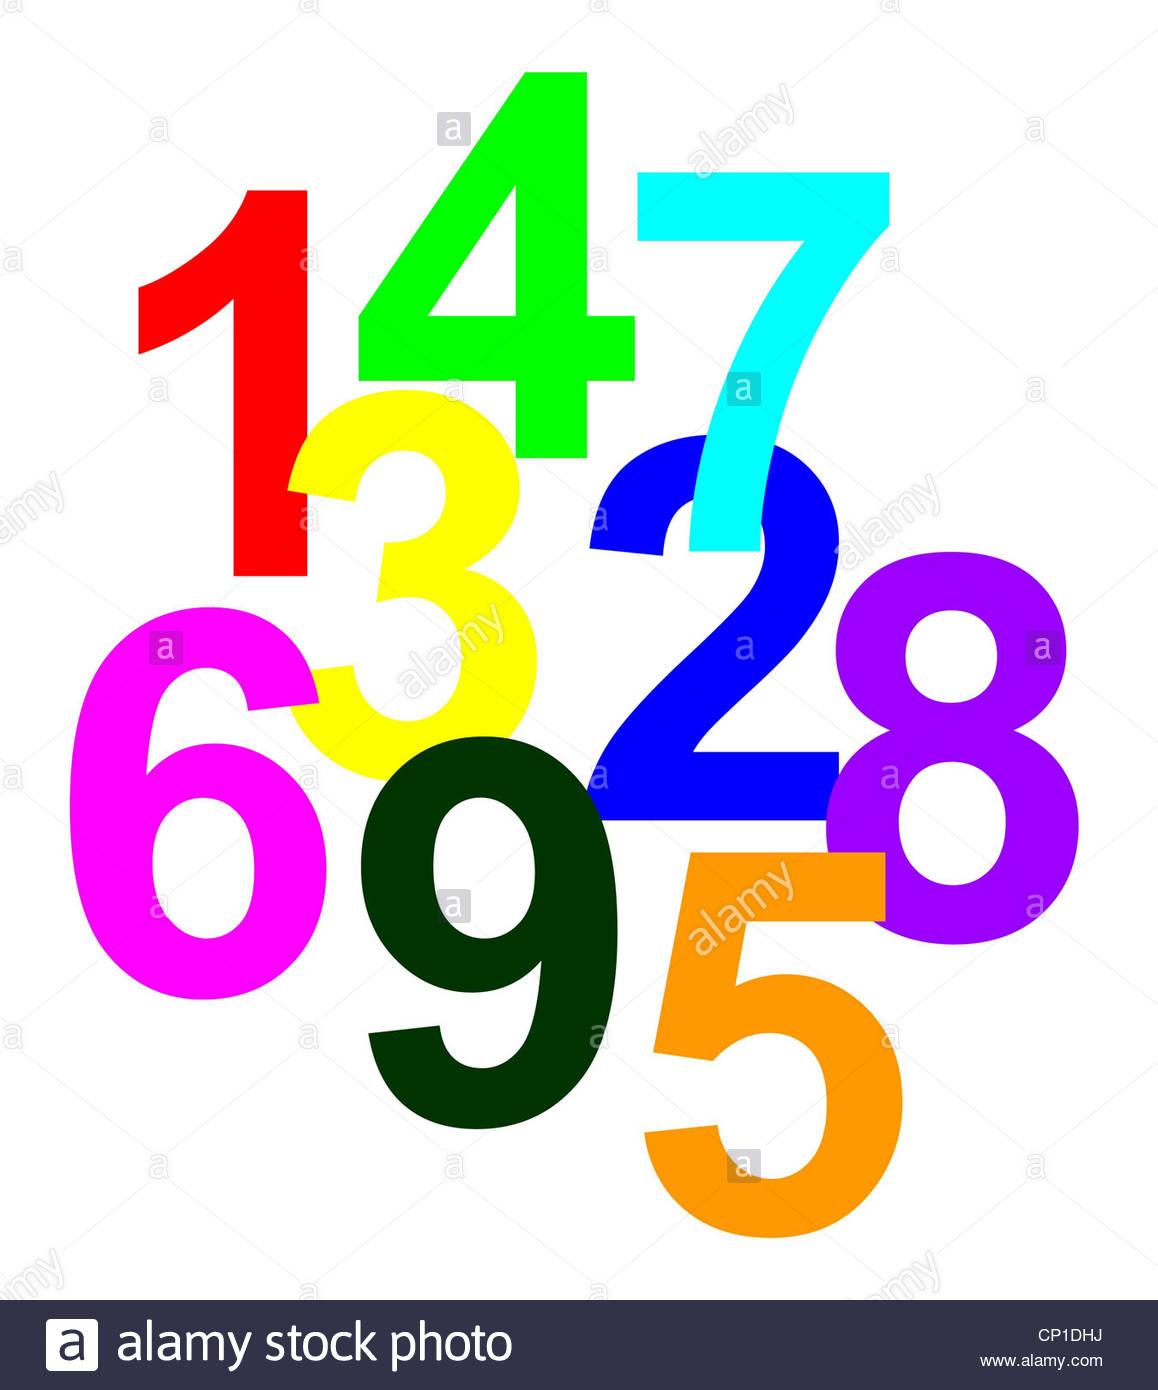 Superstition, Numerology, One Of The Oldest Secret Sciences.